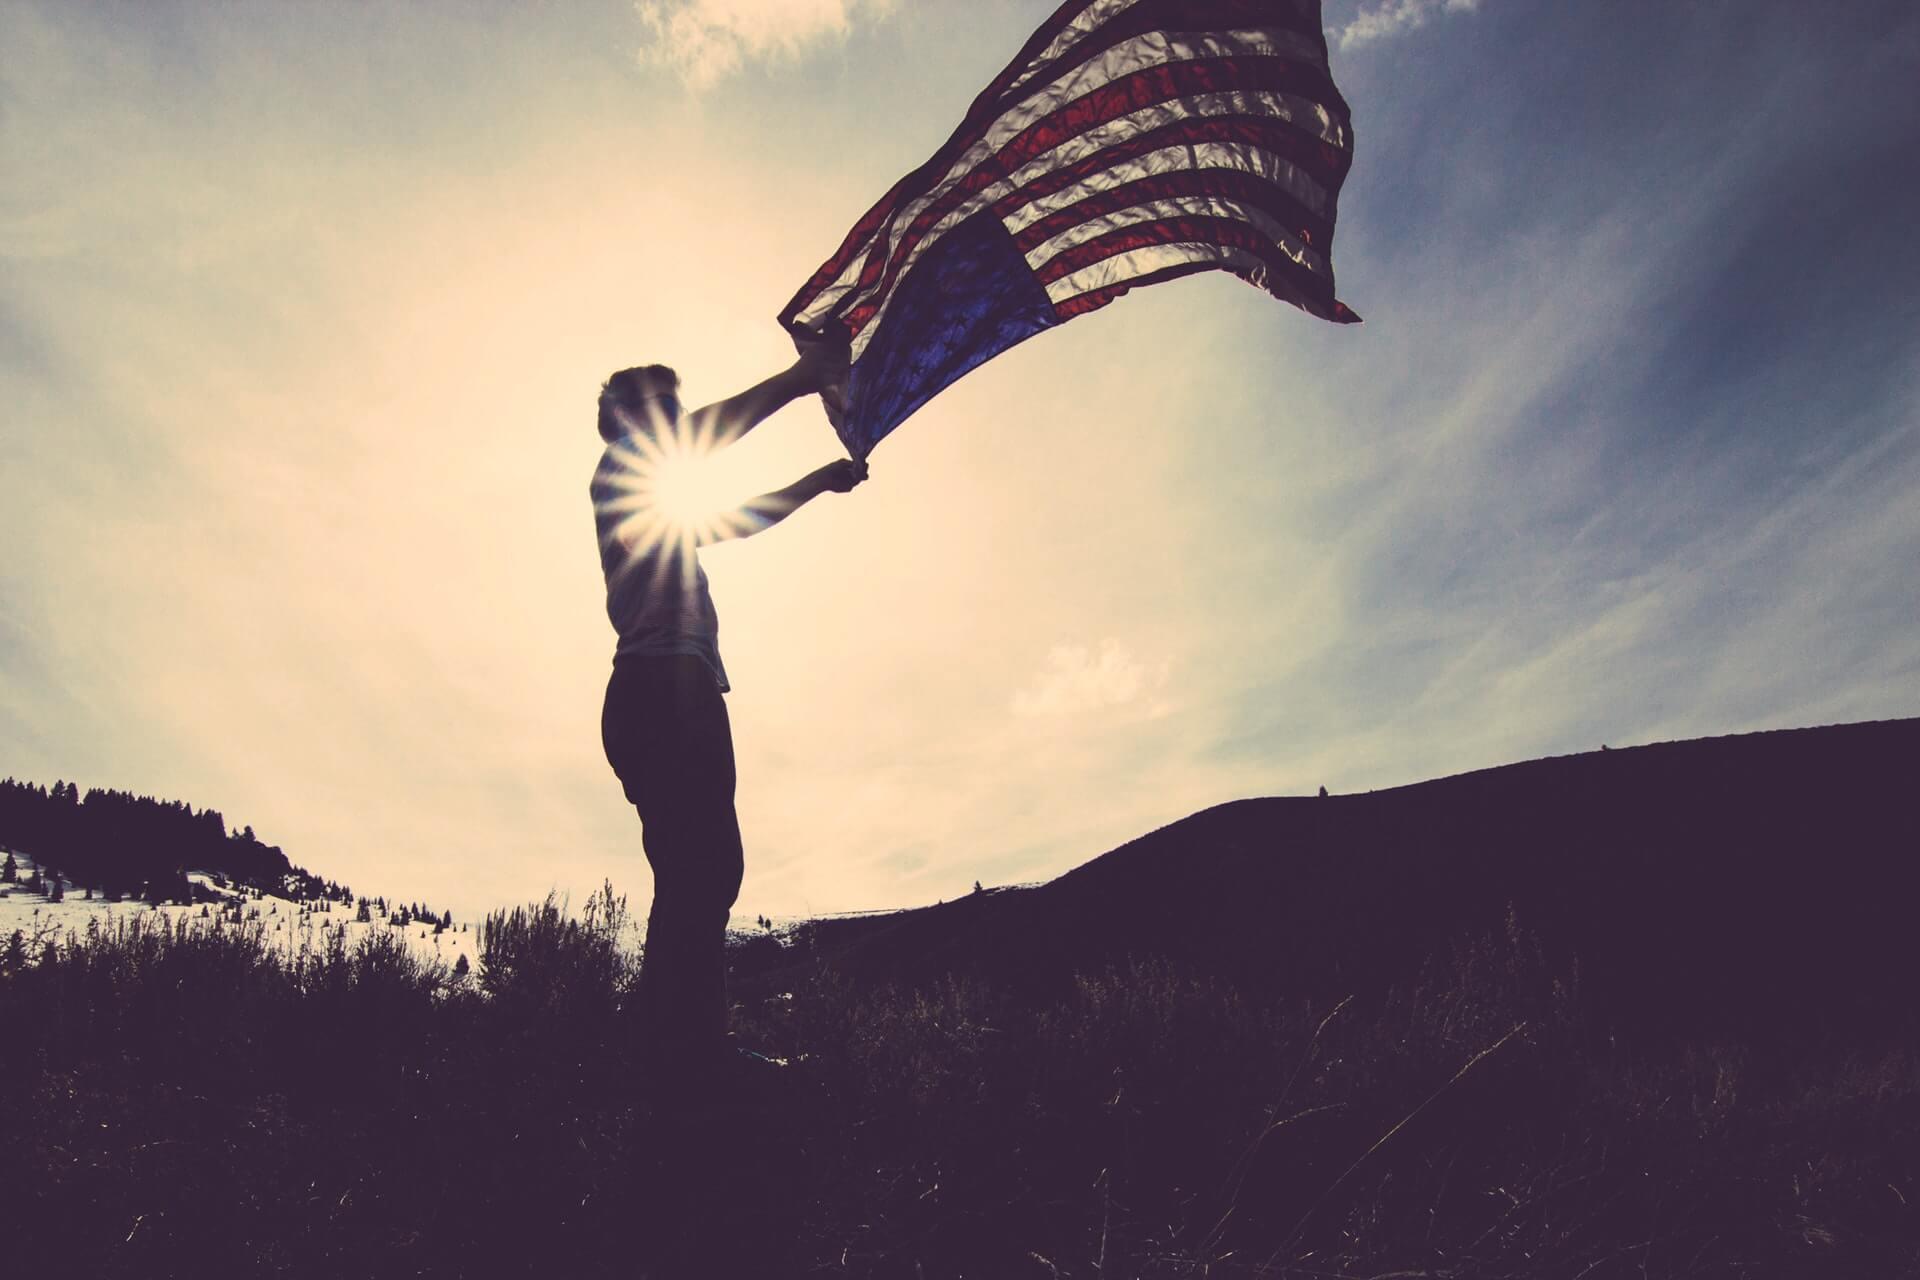 waving the American flag